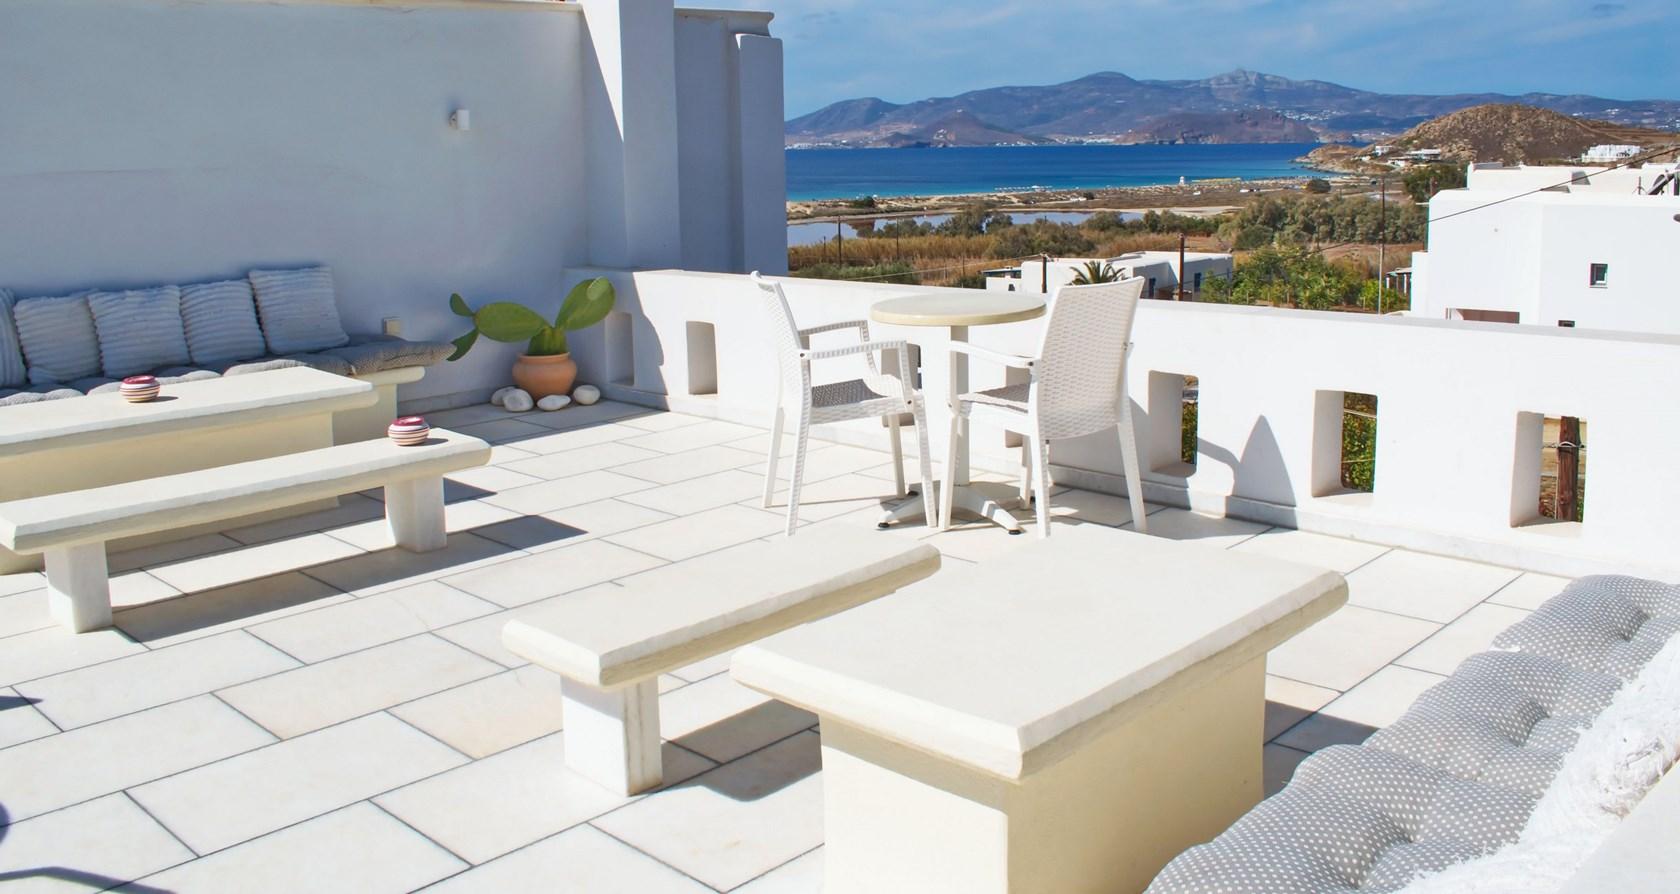 Camara Hotel - Νάξος ✦ 2 Ημέρες (1 Διανυκτέρευση) ✦ 2 άτομα + 1 παιδί έως 11 ετών ✦ Πρωινό ✦ 01/09/2021 έως 30/09/2021 ✦ Κοντά σε παραλία!